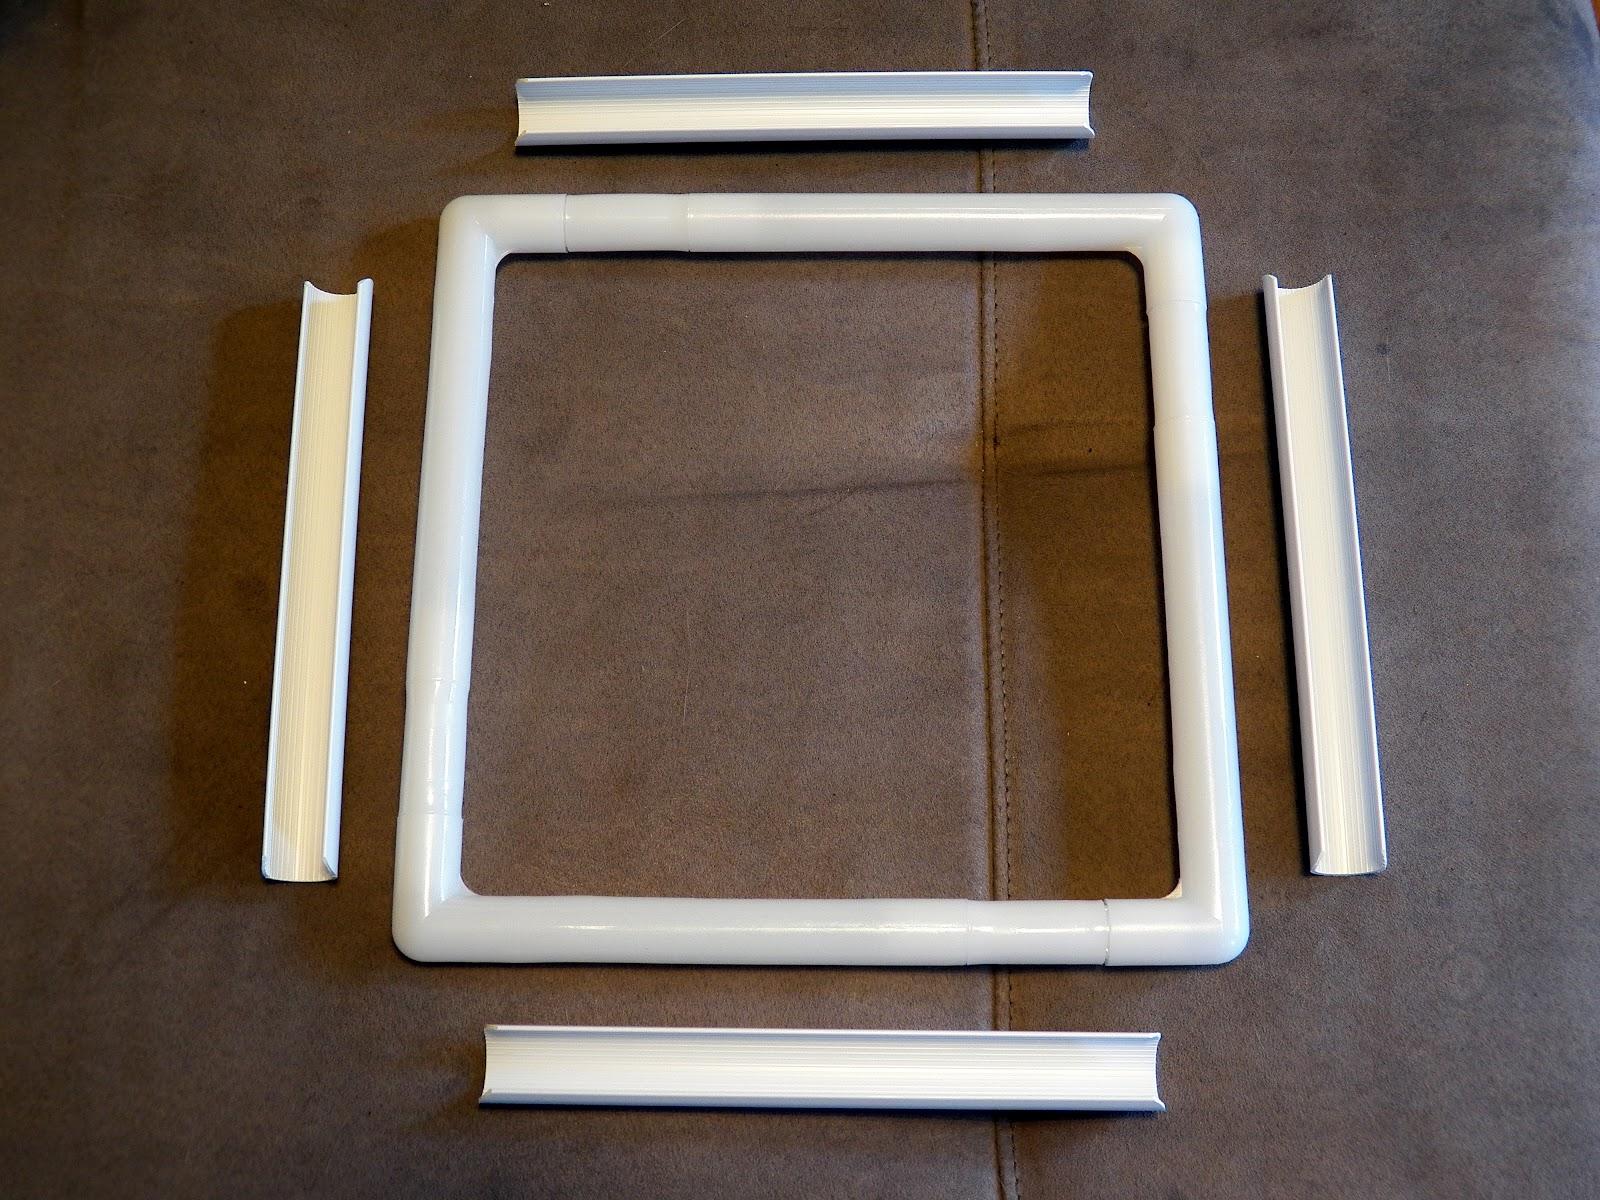 Less bitching more stitching a cross stitch blog featuring 11 q snap frame assembled jeuxipadfo Images